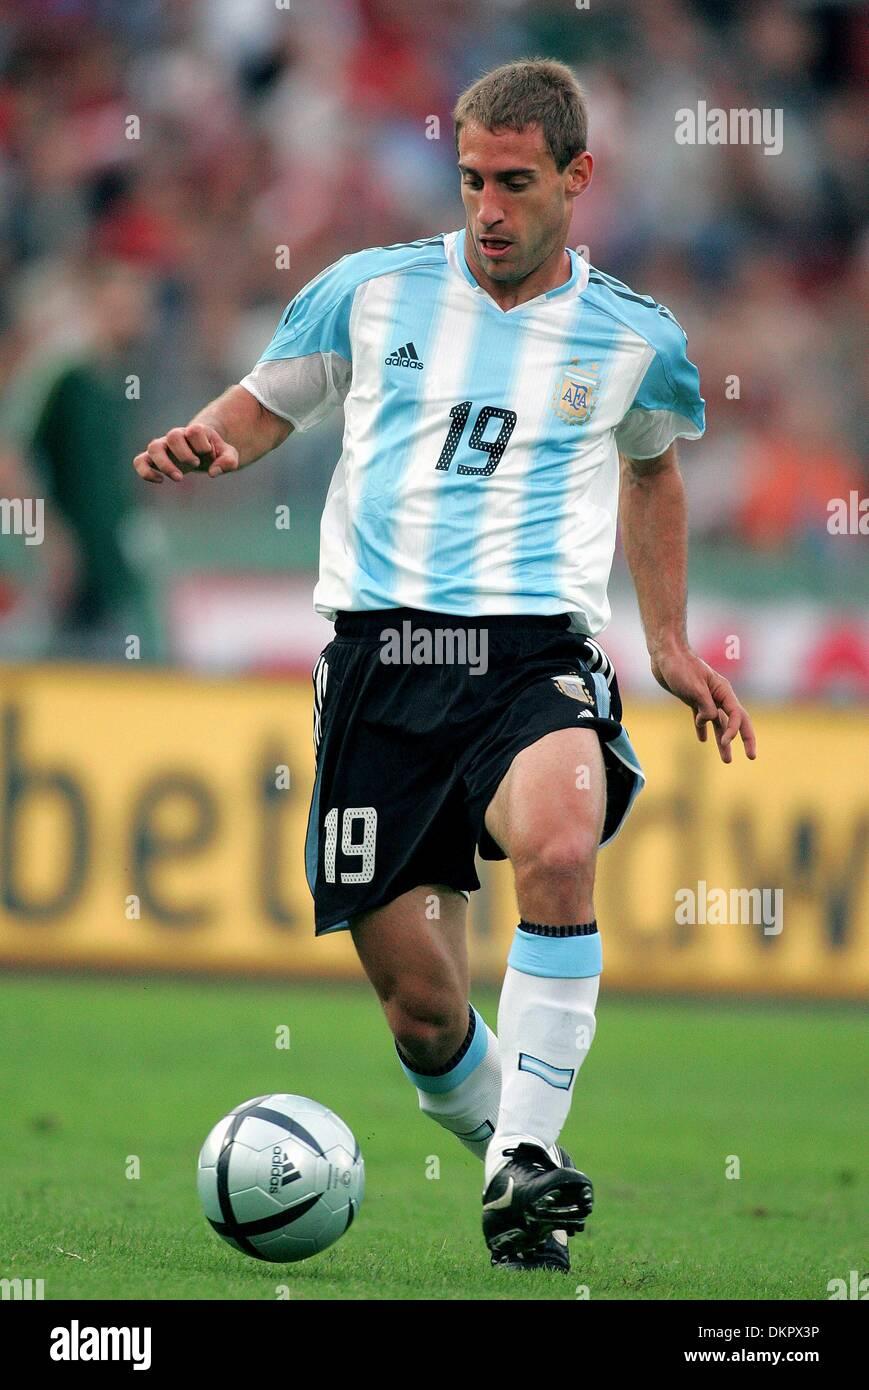 PABLO ZABALETA ARGENTINA HUNGARY V ARGENTINA PUSKAS FERENC STADION